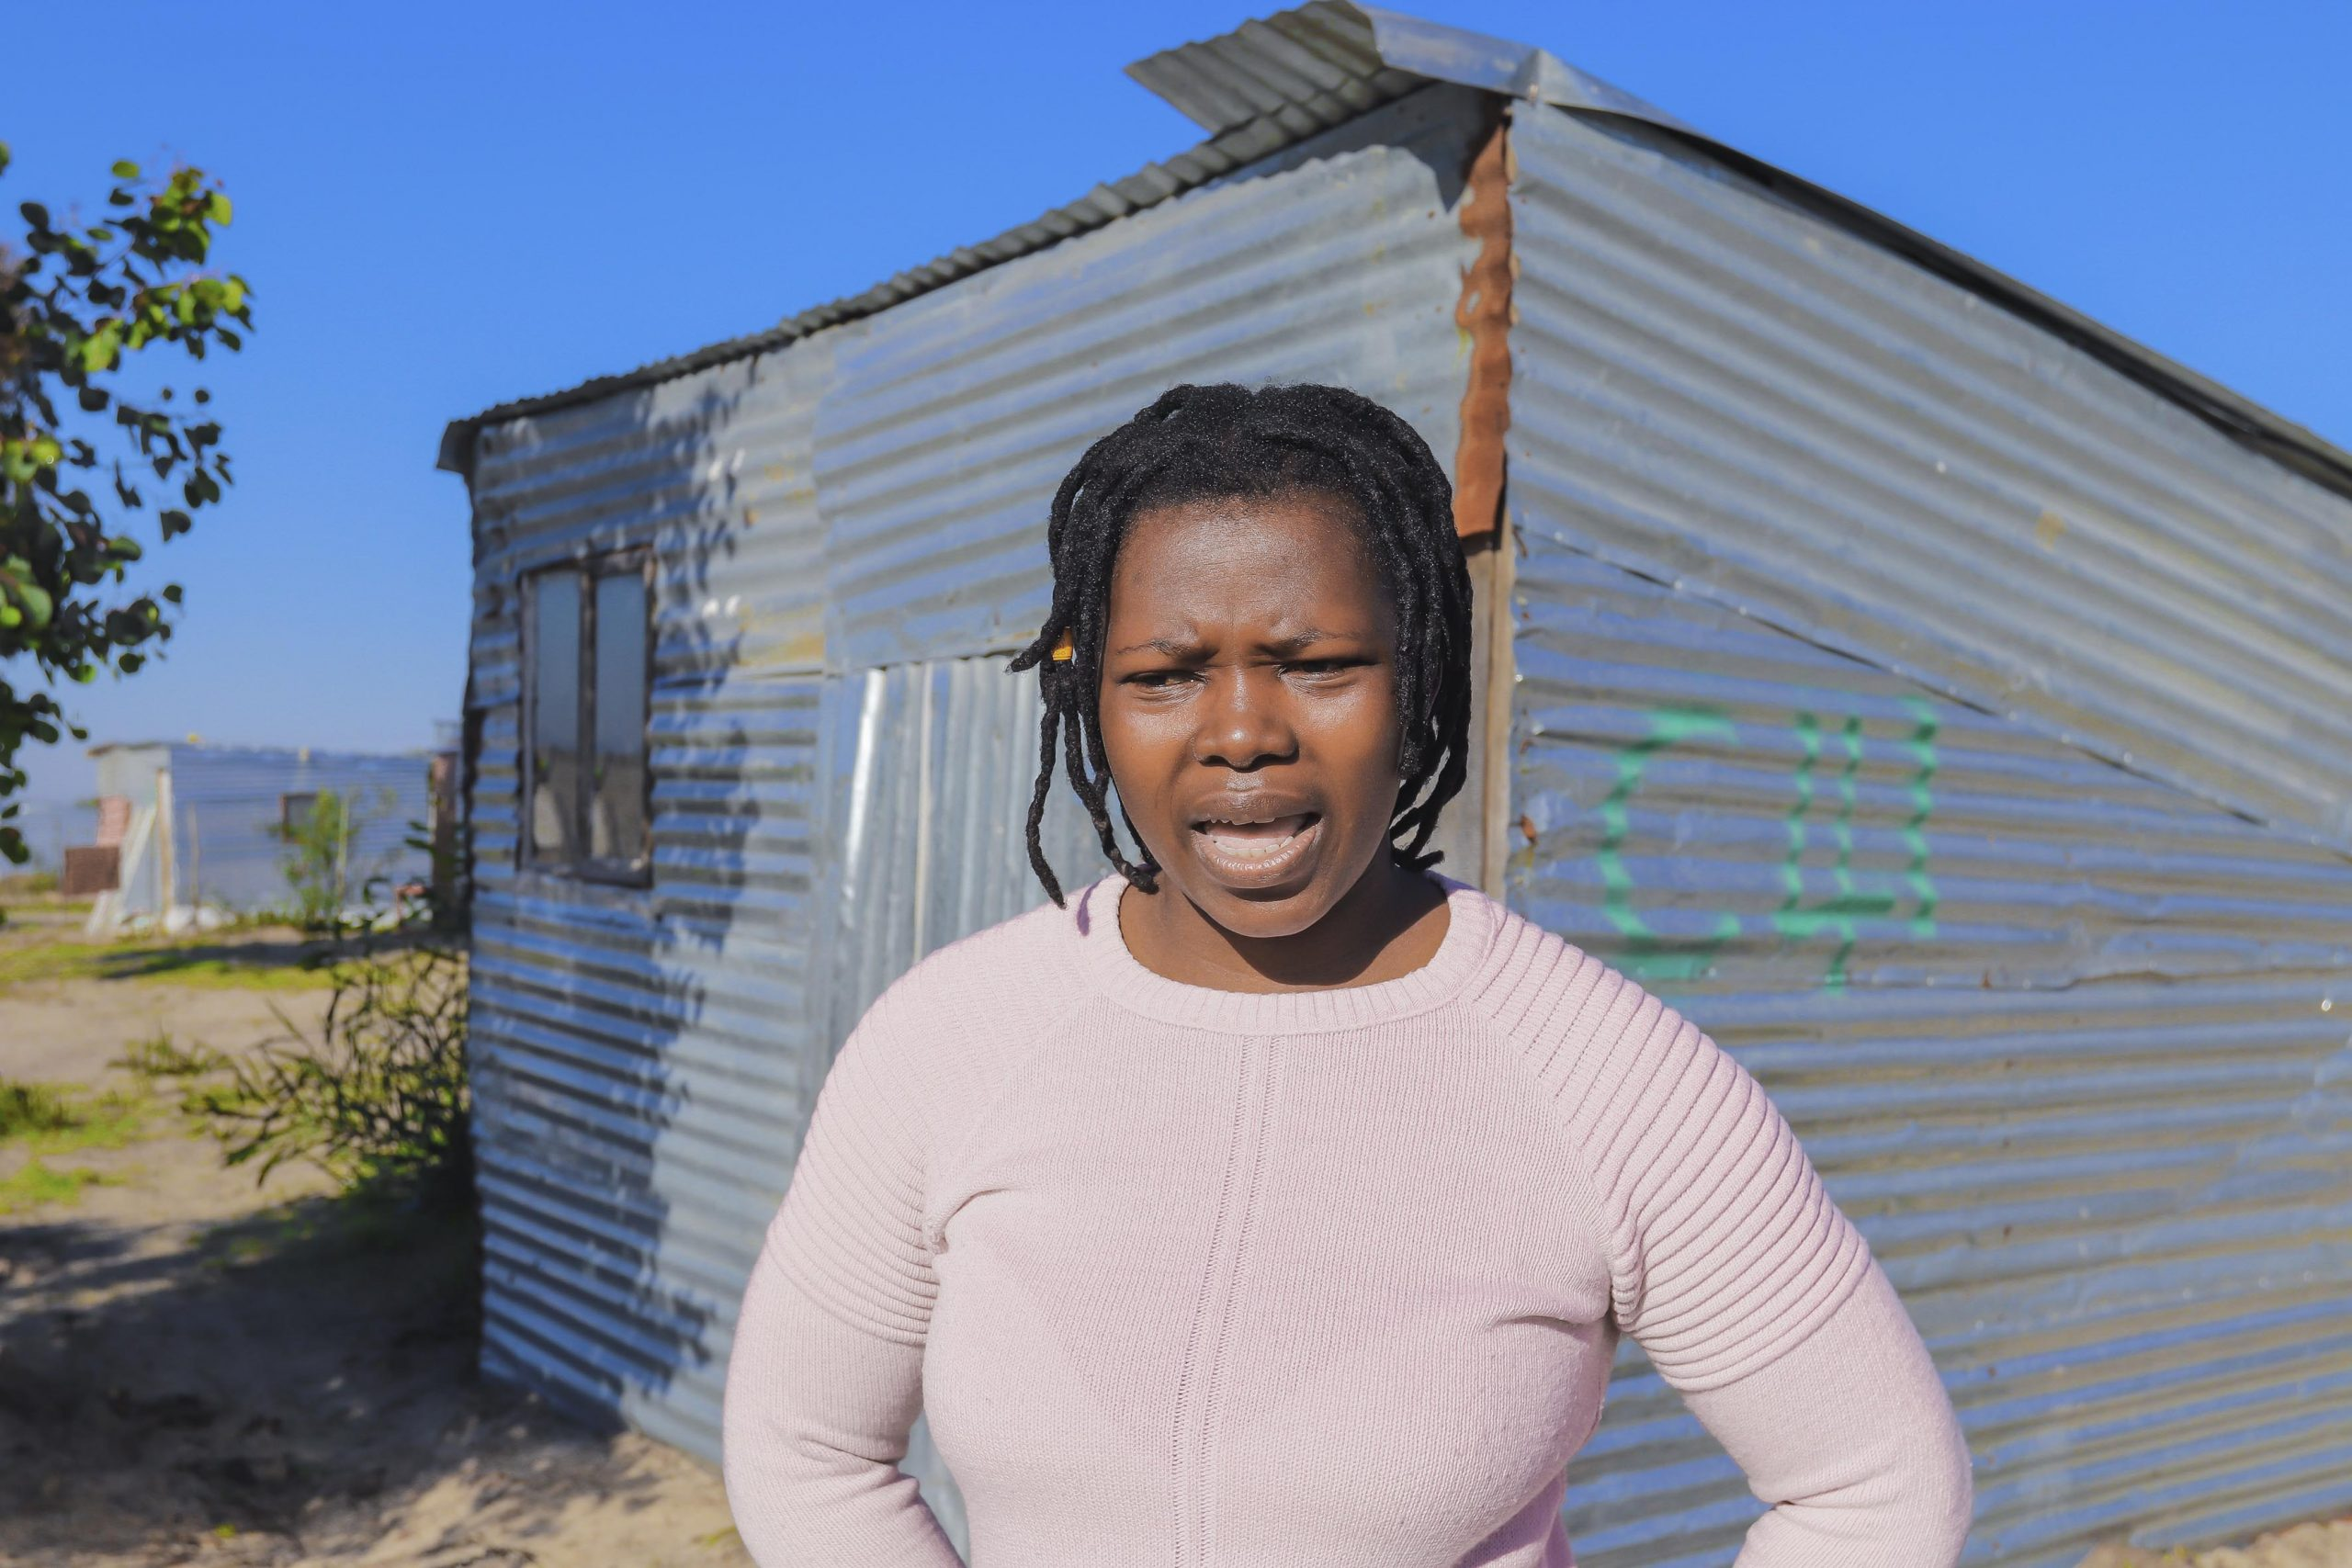 23 July 2020: Nomawethu Nciwa says she was slapped and kicked while being arrested on 16 July.